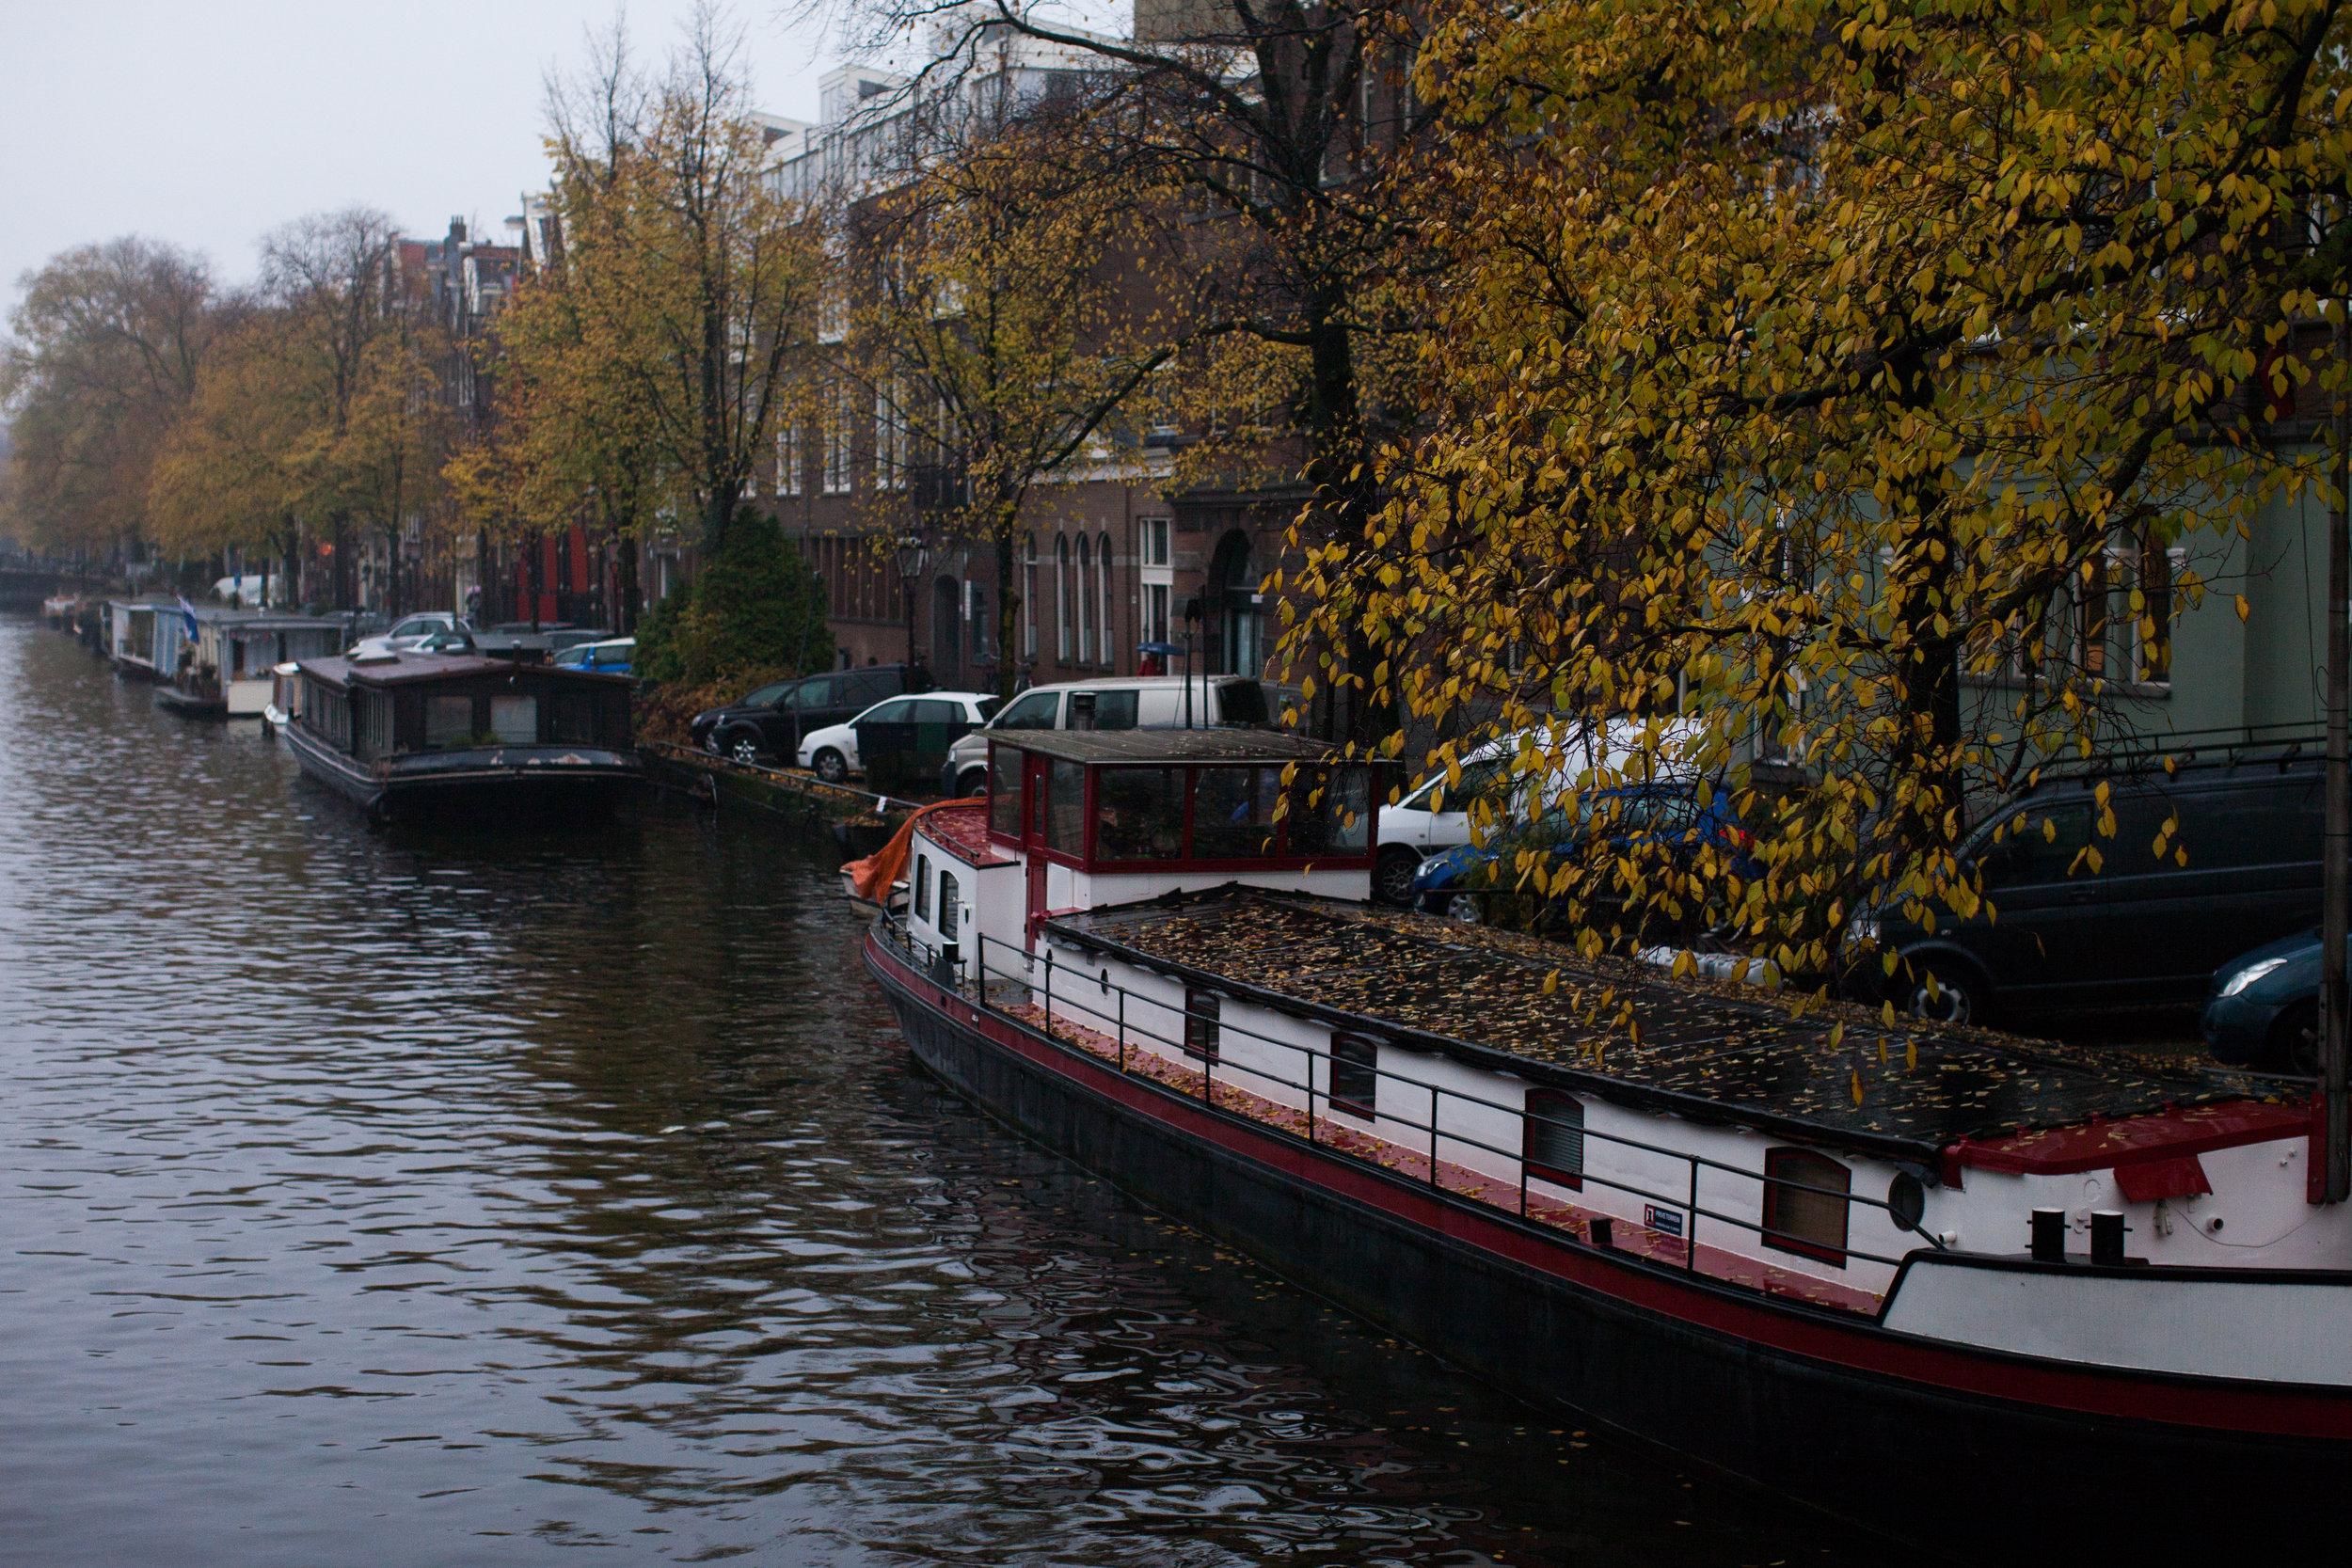 amsterdam (10 of 11).jpg